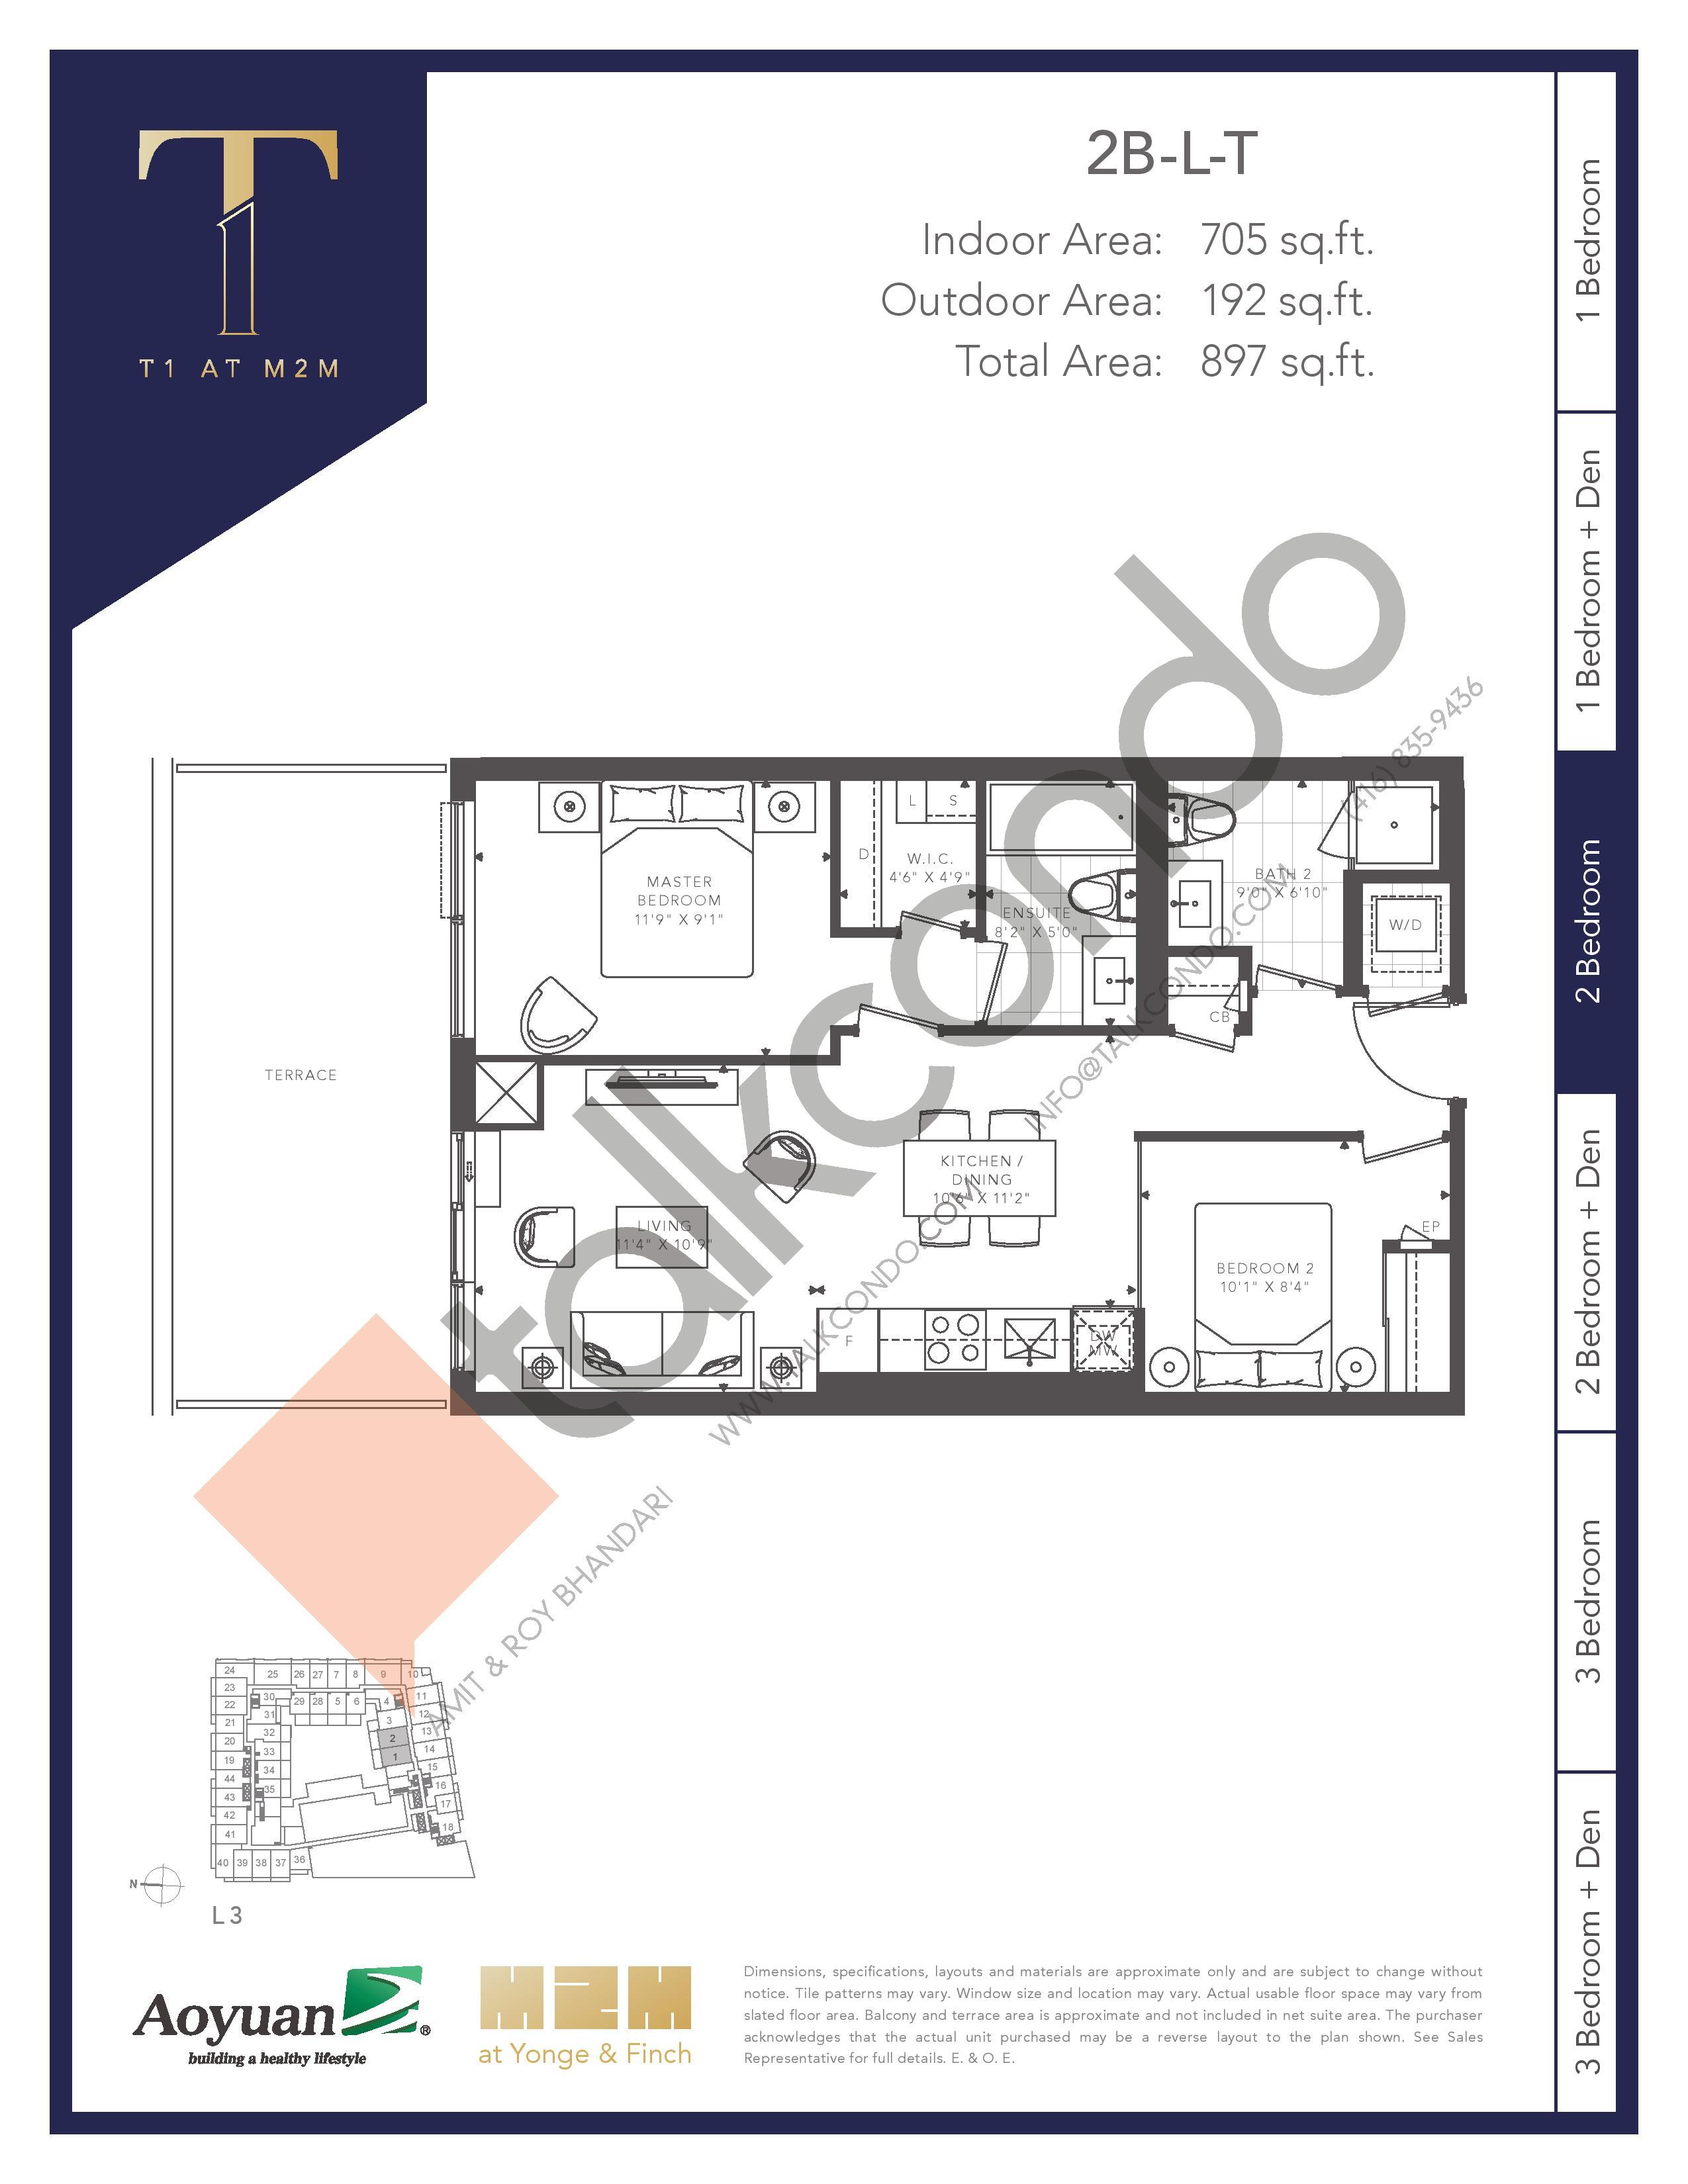 2B-L-T (Tower) Floor Plan at T1 at M2M Condos - 705 sq.ft